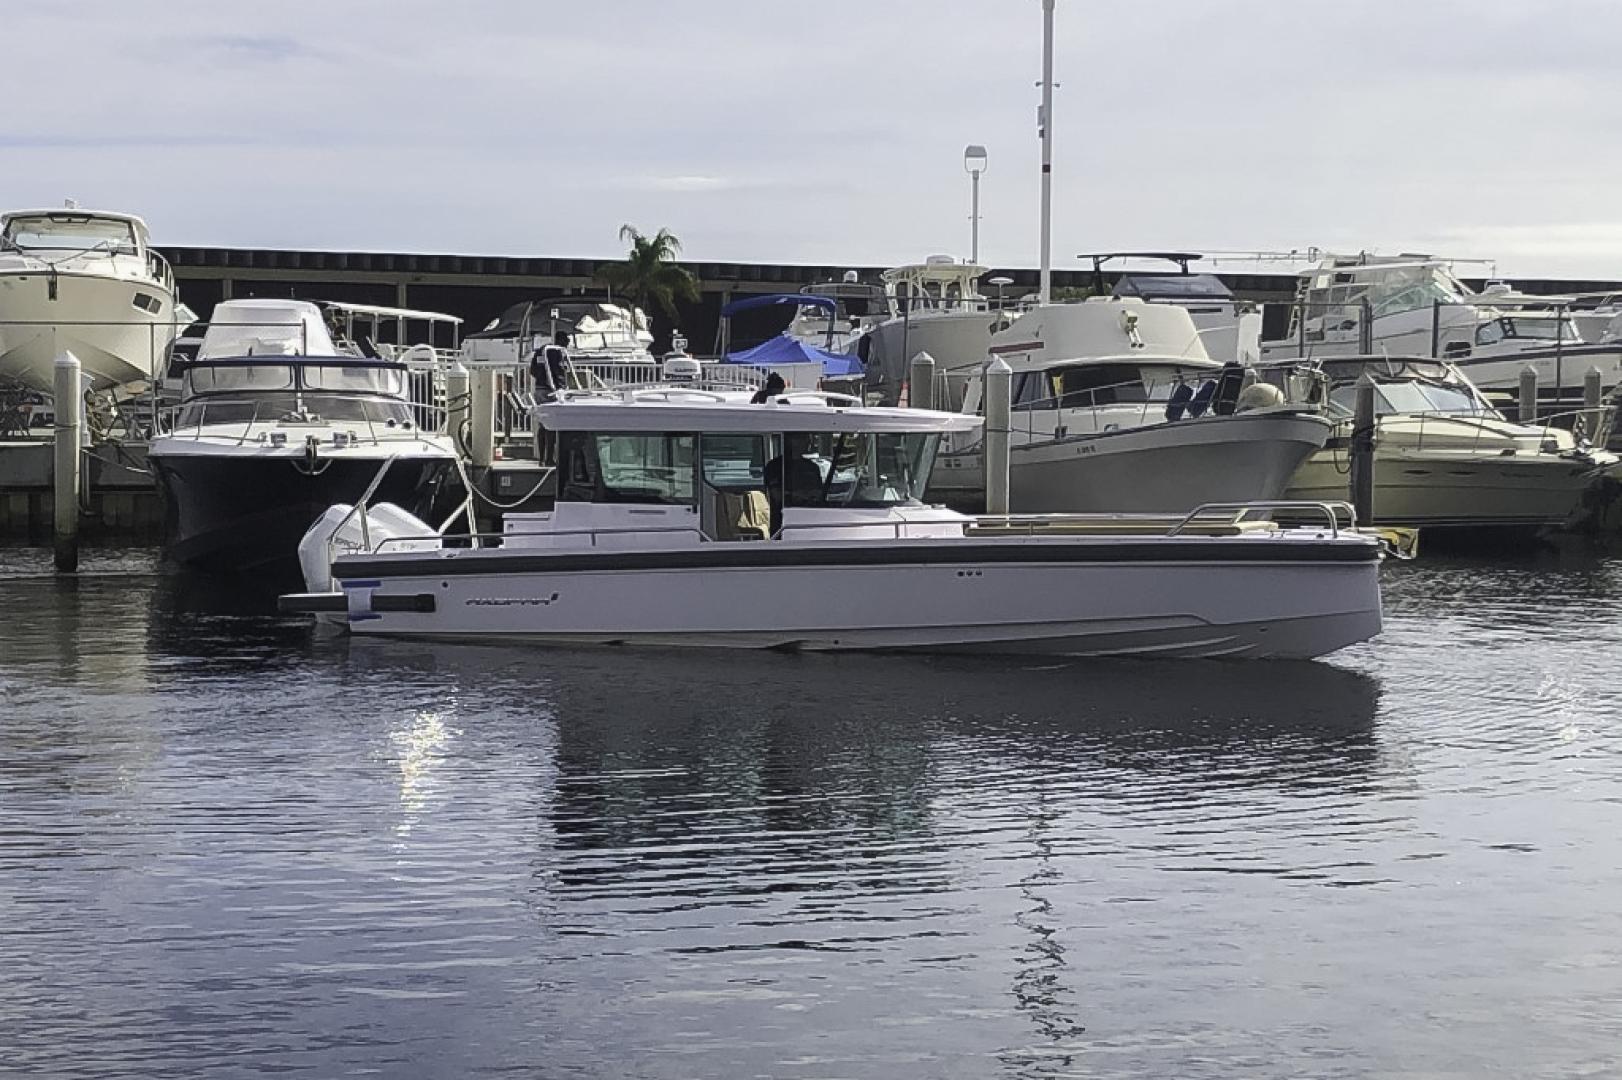 Axopar-28 CABIN 2020-Axopar 28 CABIN Fort Lauderdale-Florida-United States-1586680 | Thumbnail